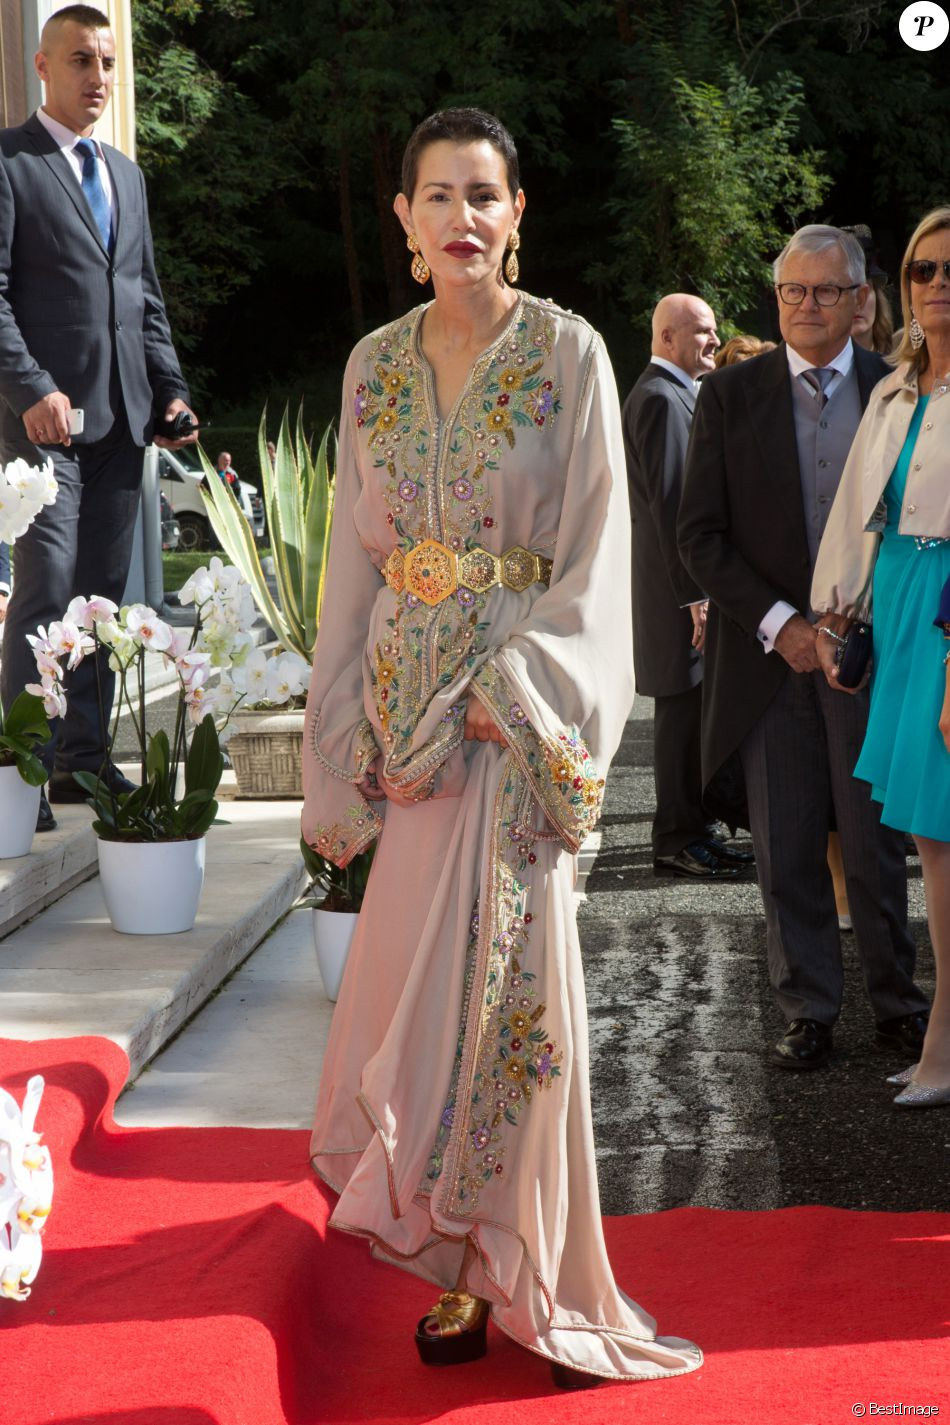 Lalla Meryem Majestueuse Au Mariage Du Prince D Albanie